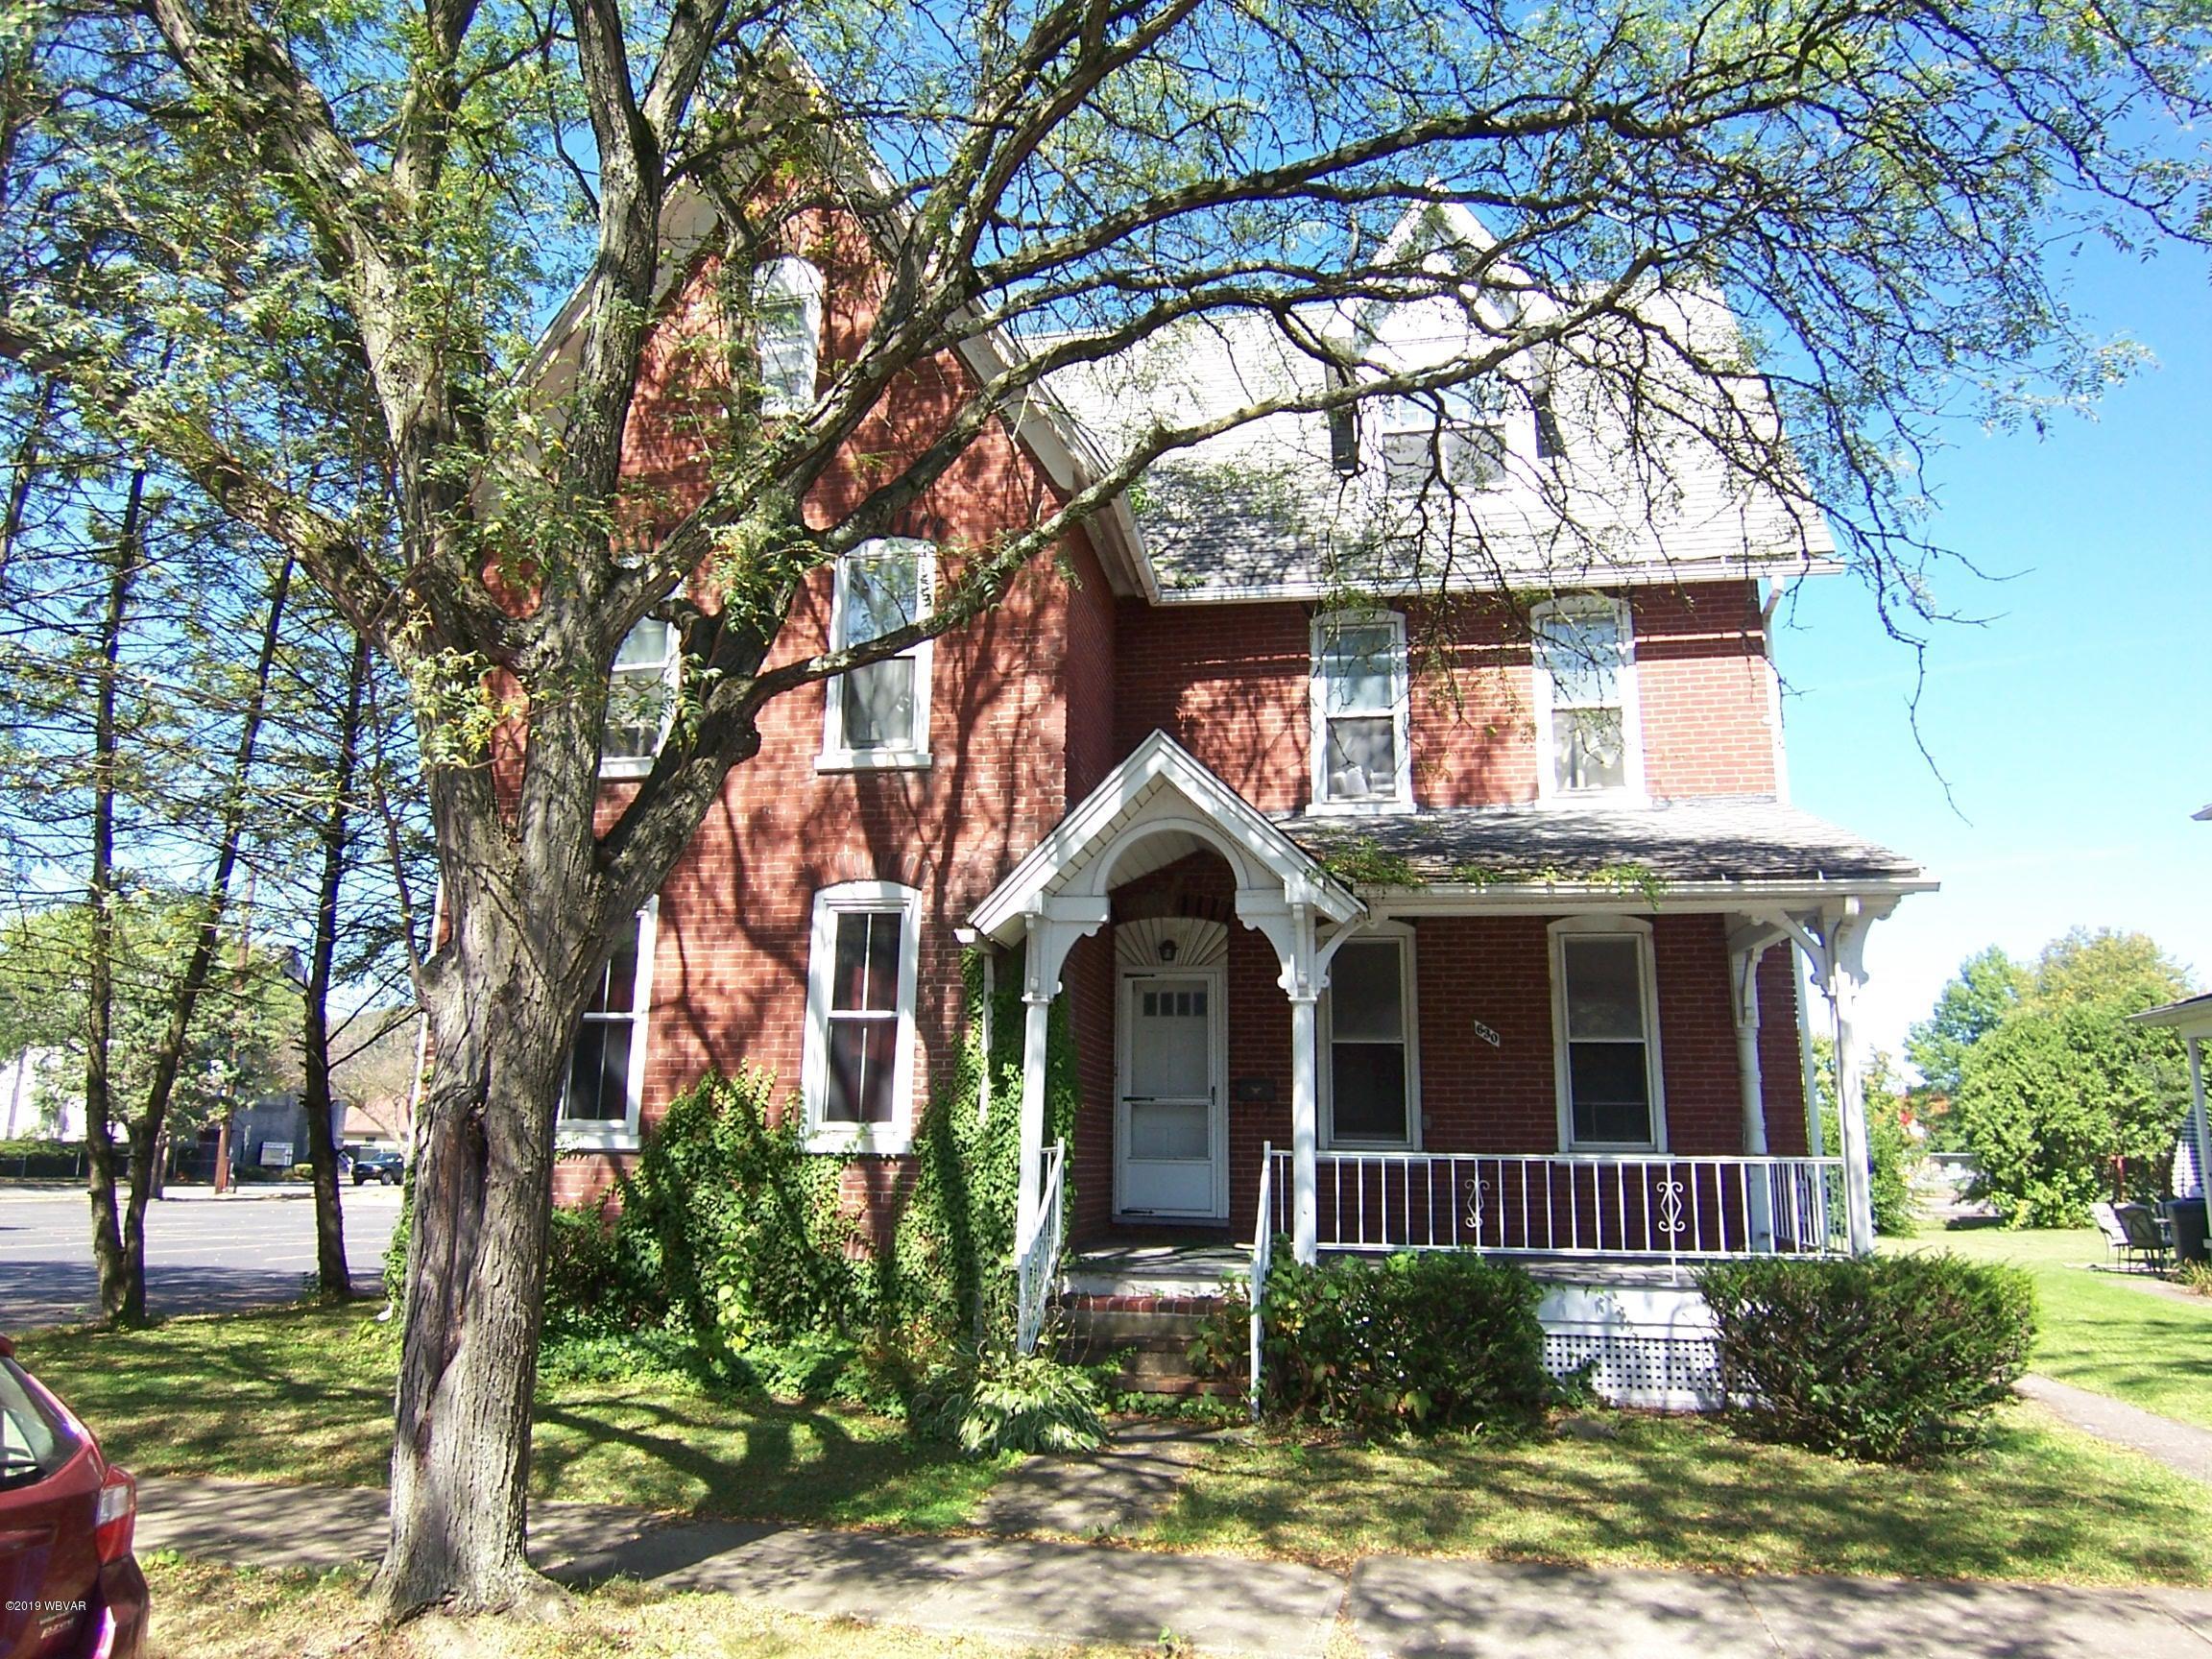 630 EDWIN STREET,Williamsport,PA 17701,6 Bedrooms Bedrooms,3.5 BathroomsBathrooms,Residential,EDWIN,WB-88593